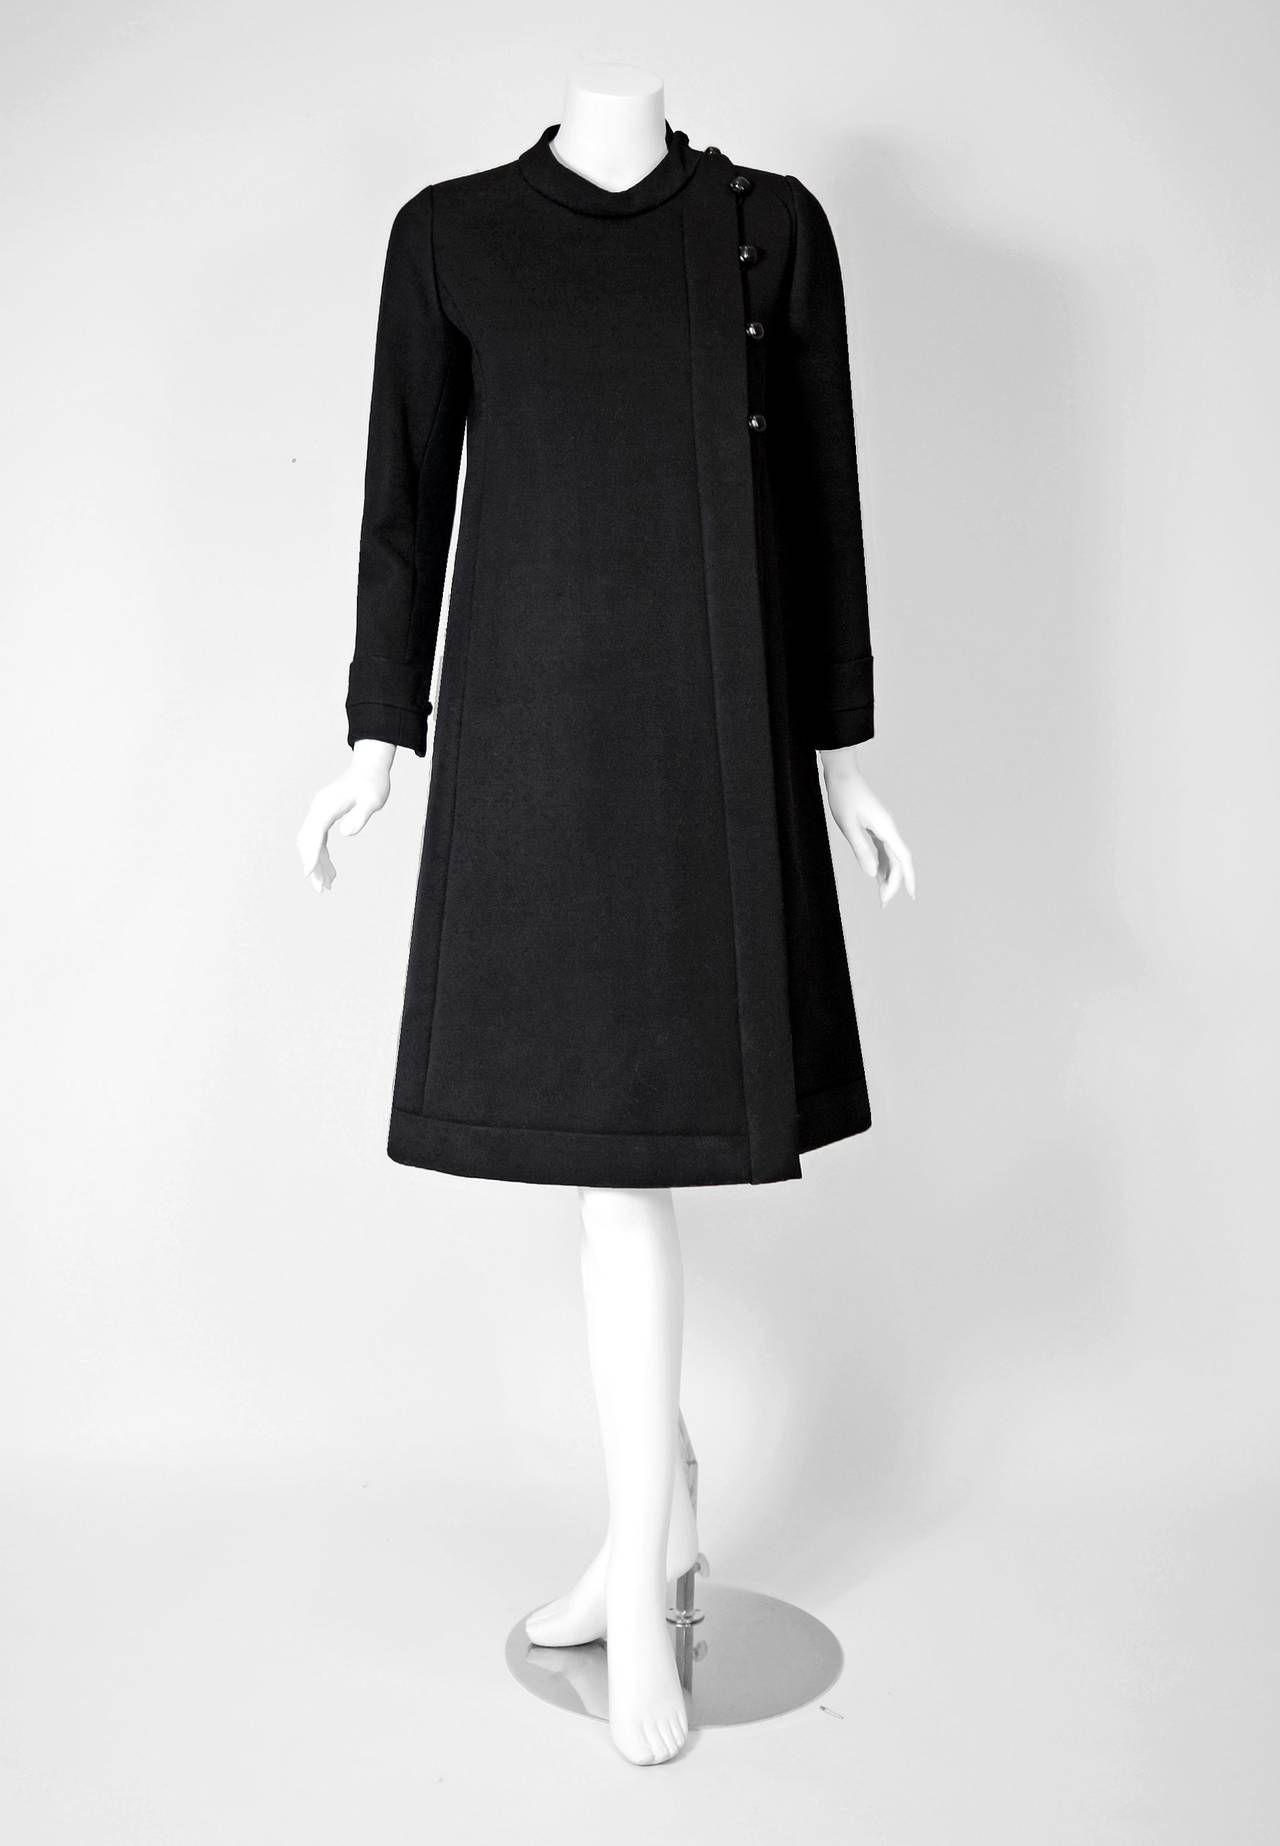 57ea78e56c1 1960 s Ronald Amey Black Tailored Silk-Twill Mod Space-Age Cocktail Dress   amp